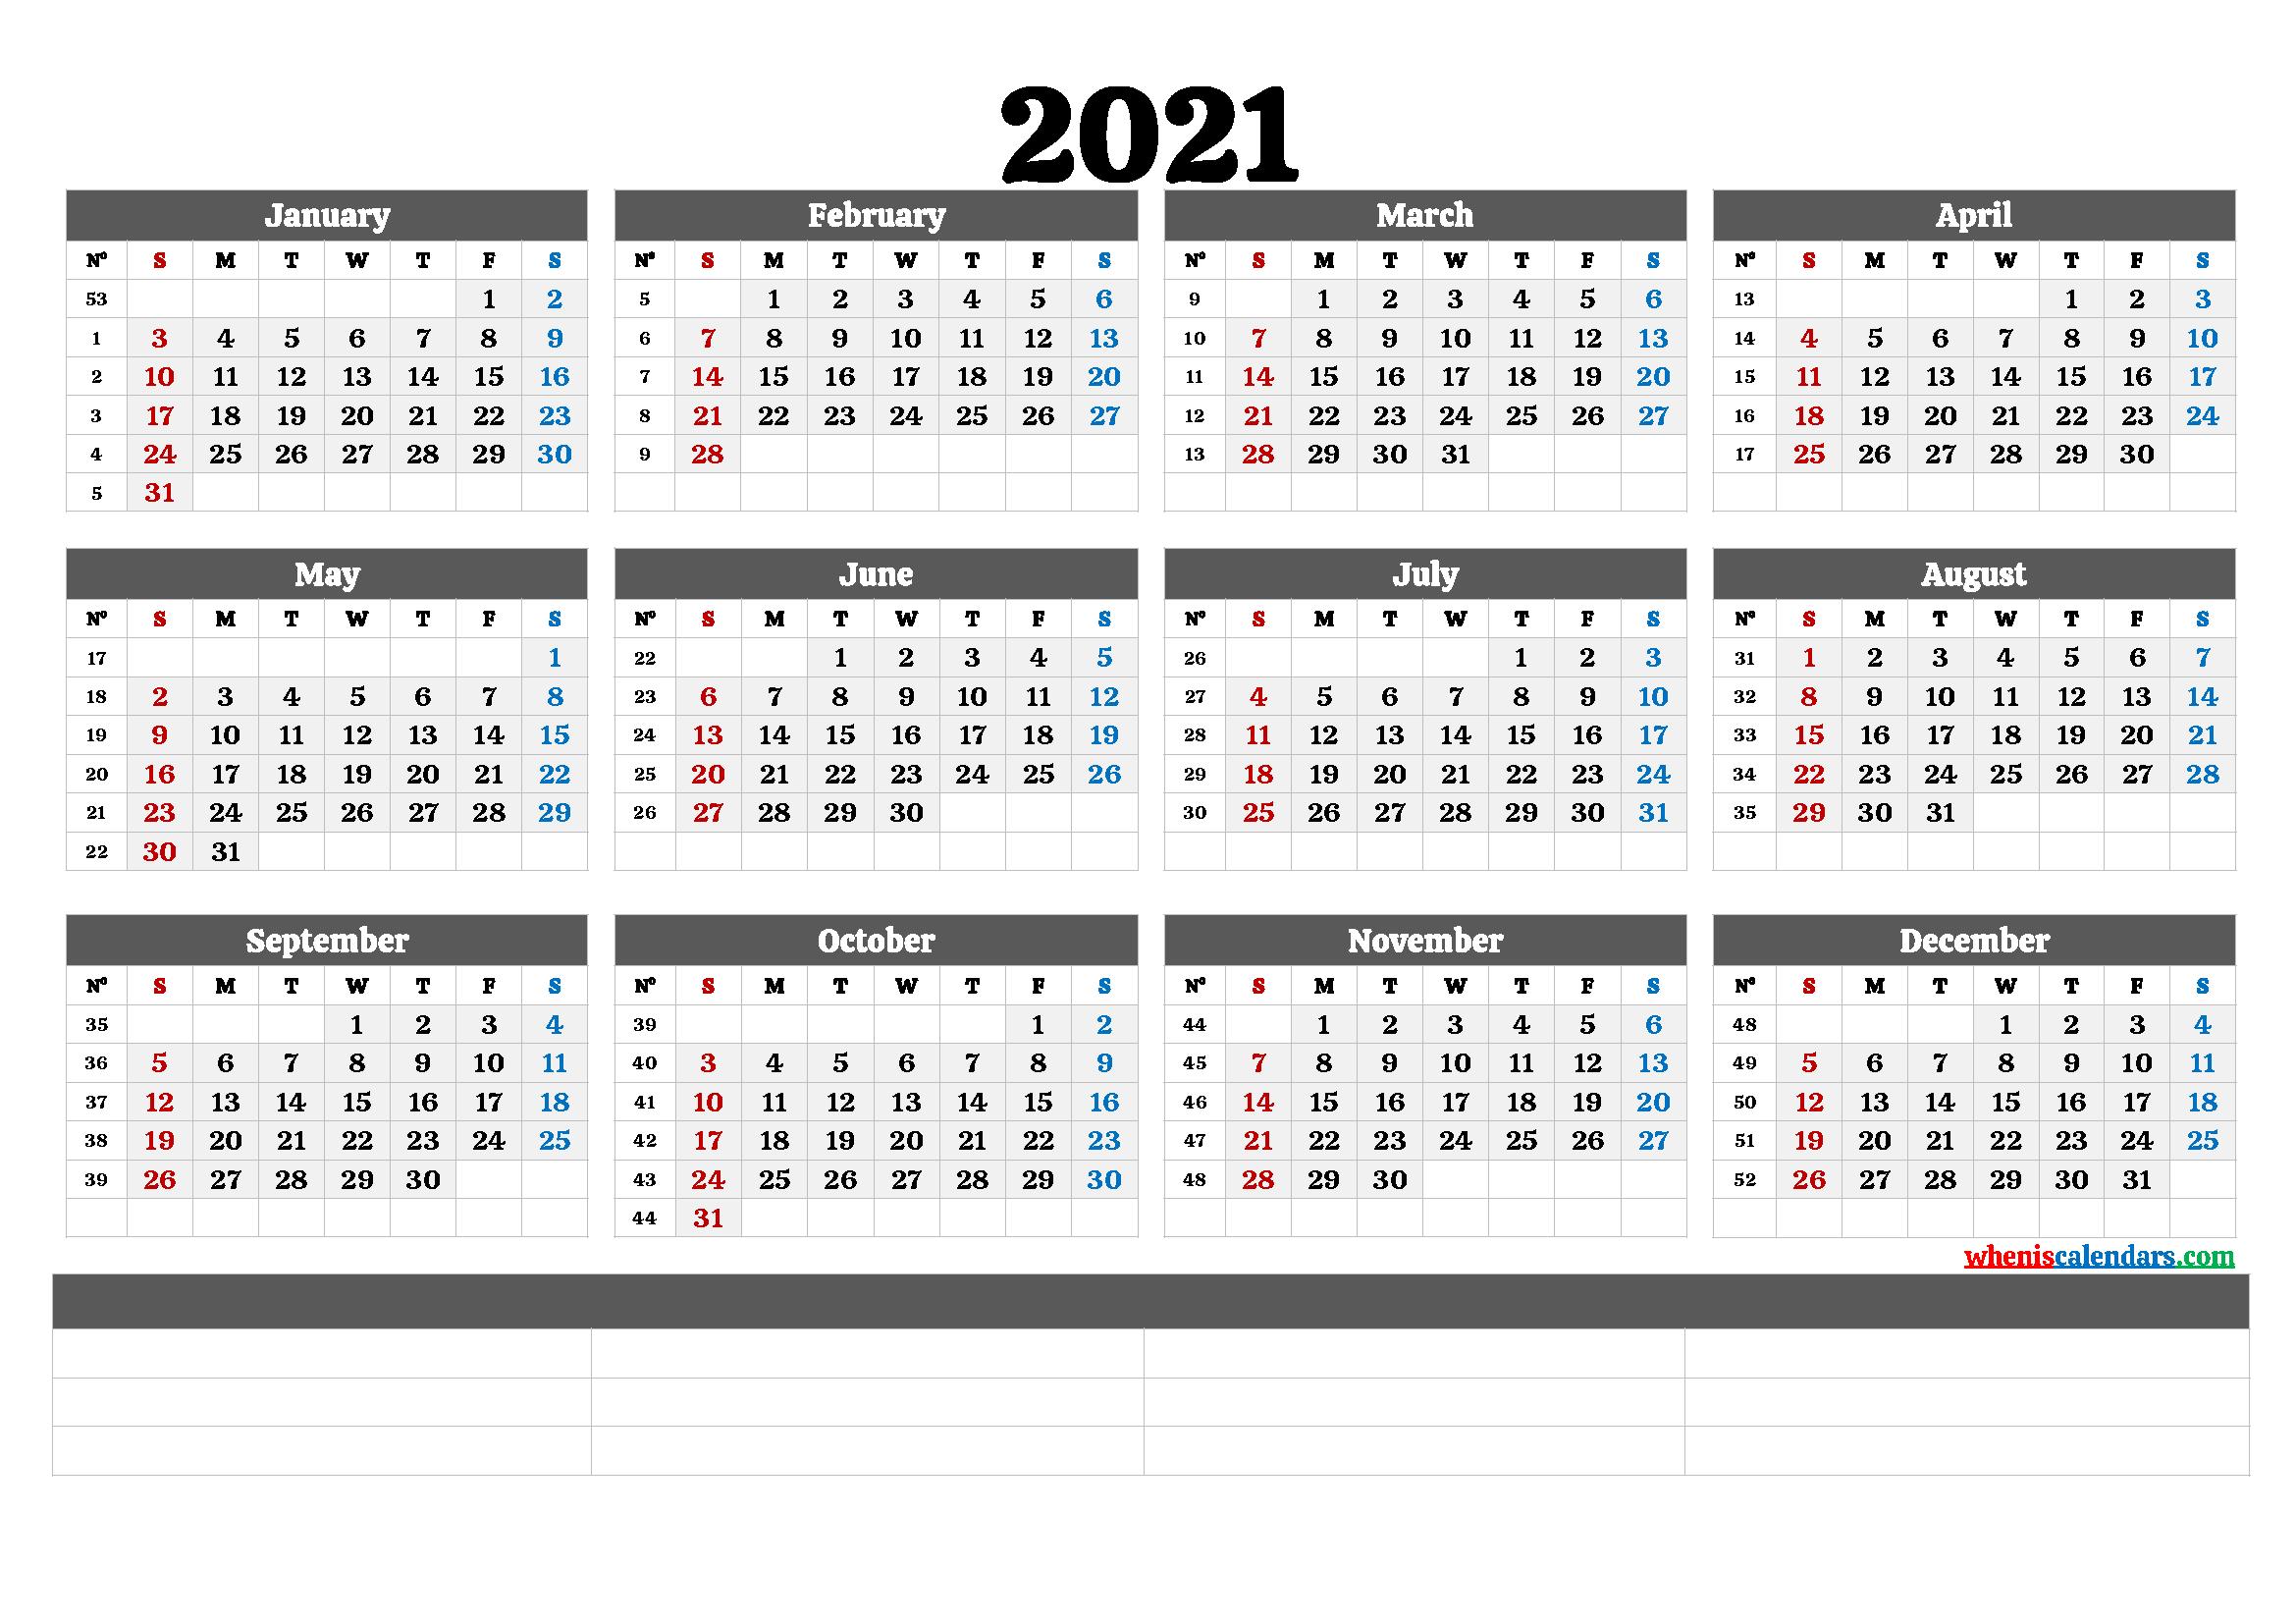 2021 Free Printable Yearly Calendar with Week Numbers